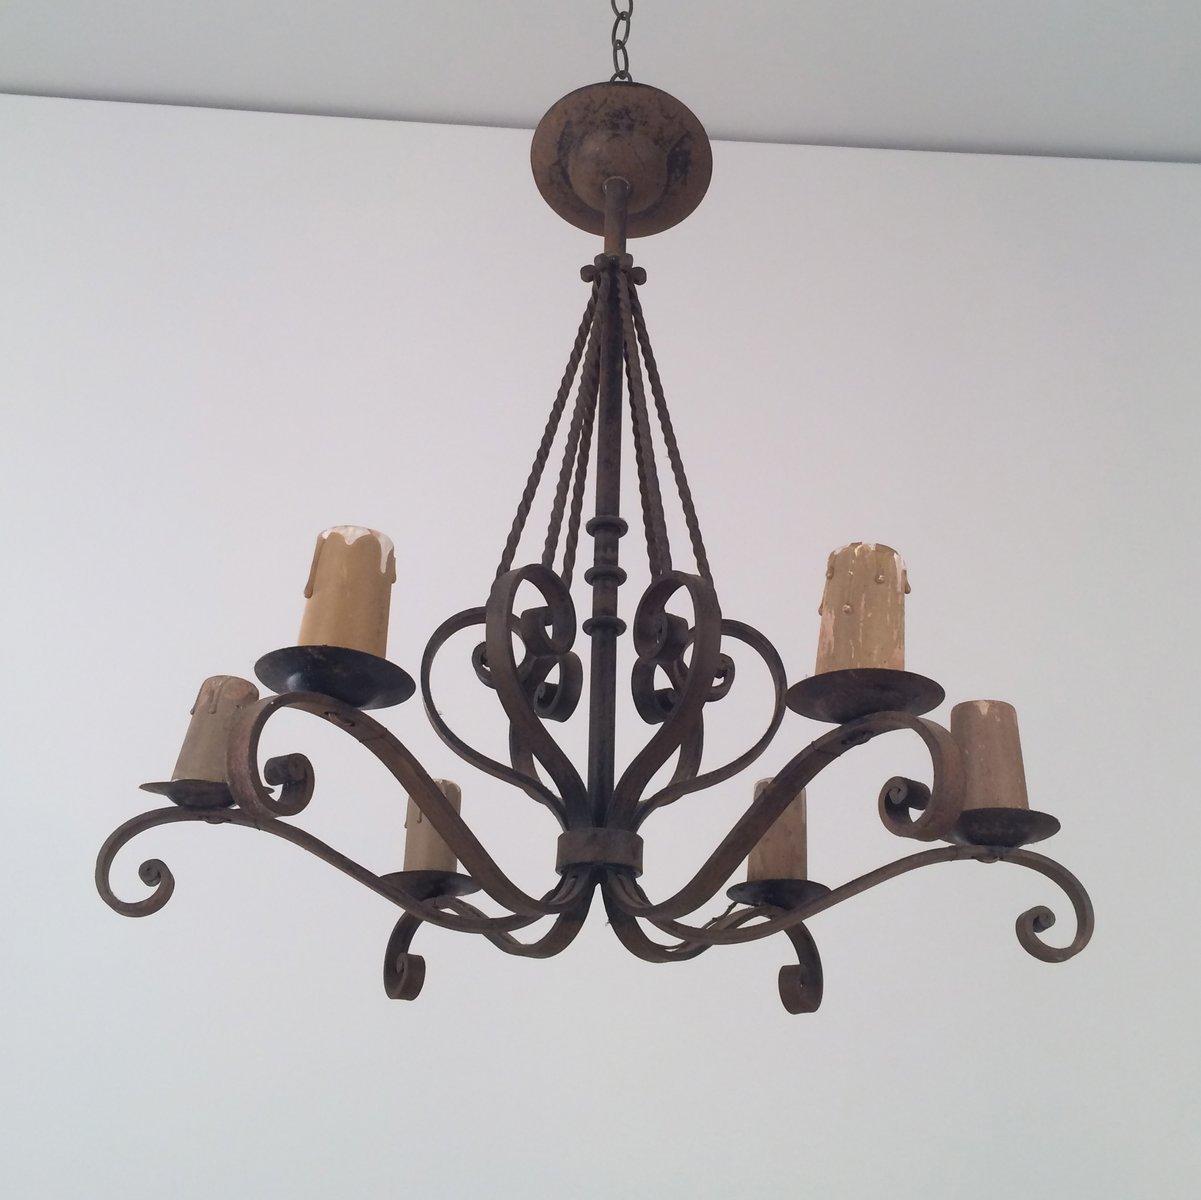 lustre en fer forg avec six bougeoirs 1920s en vente sur. Black Bedroom Furniture Sets. Home Design Ideas